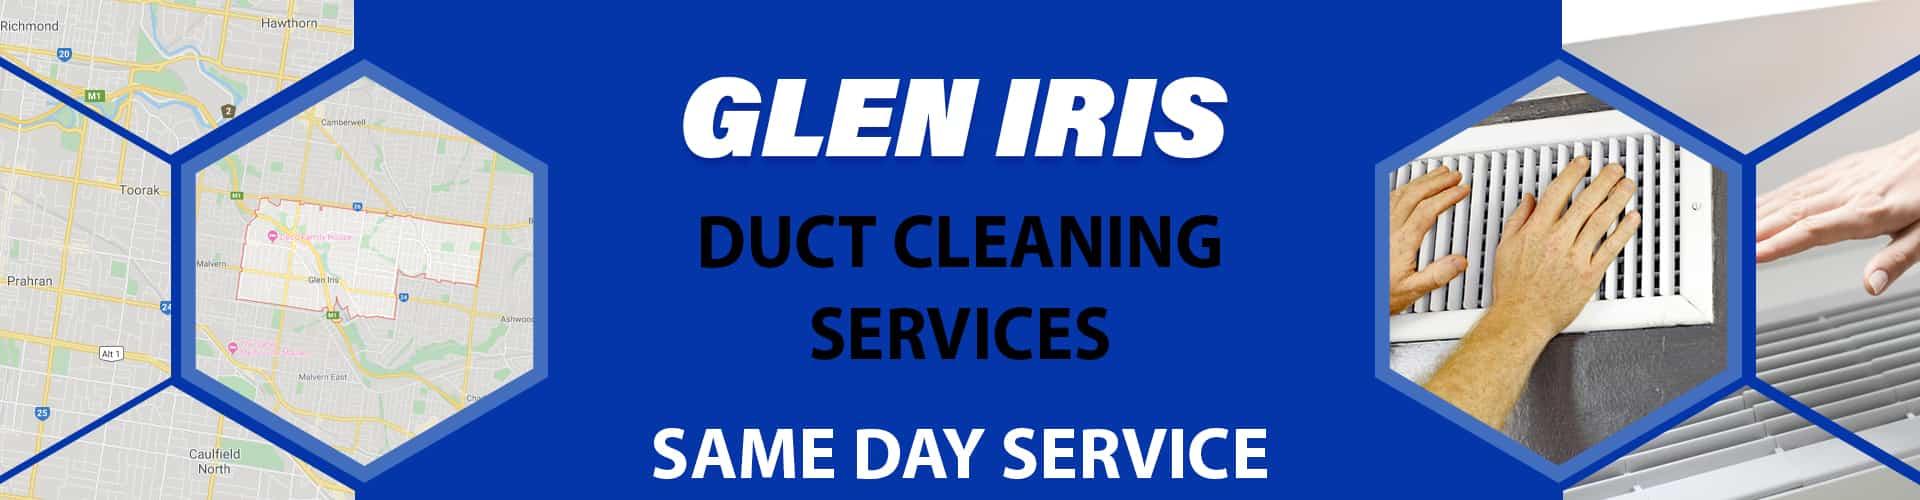 Duct Cleaning Glen Iris